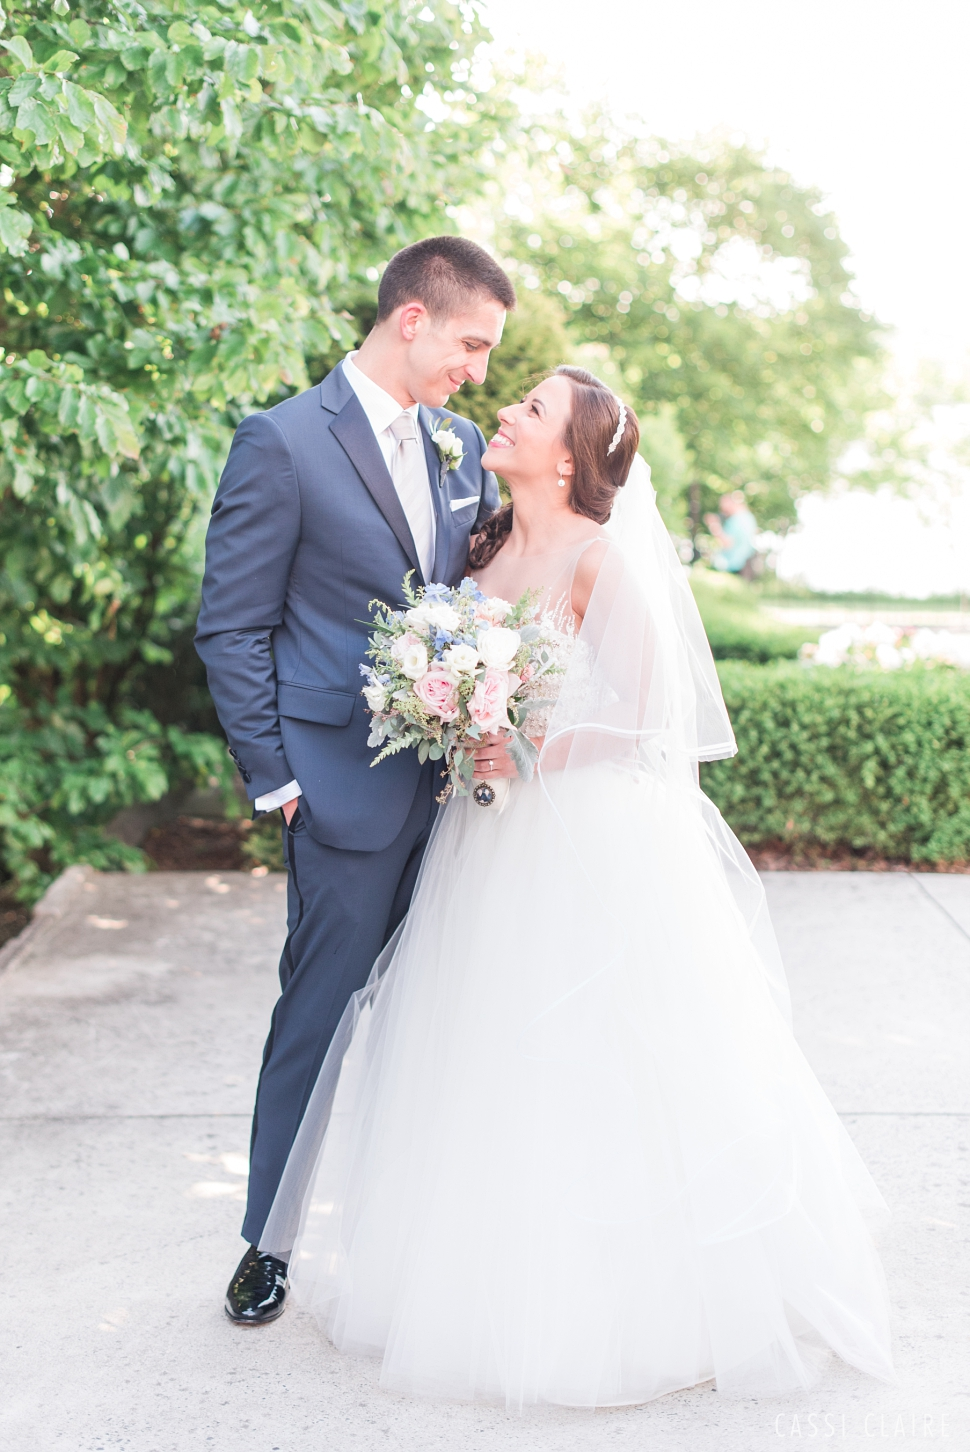 Lake-House-Inn-PA-Wedding_Cassi-Claire_13.jpg